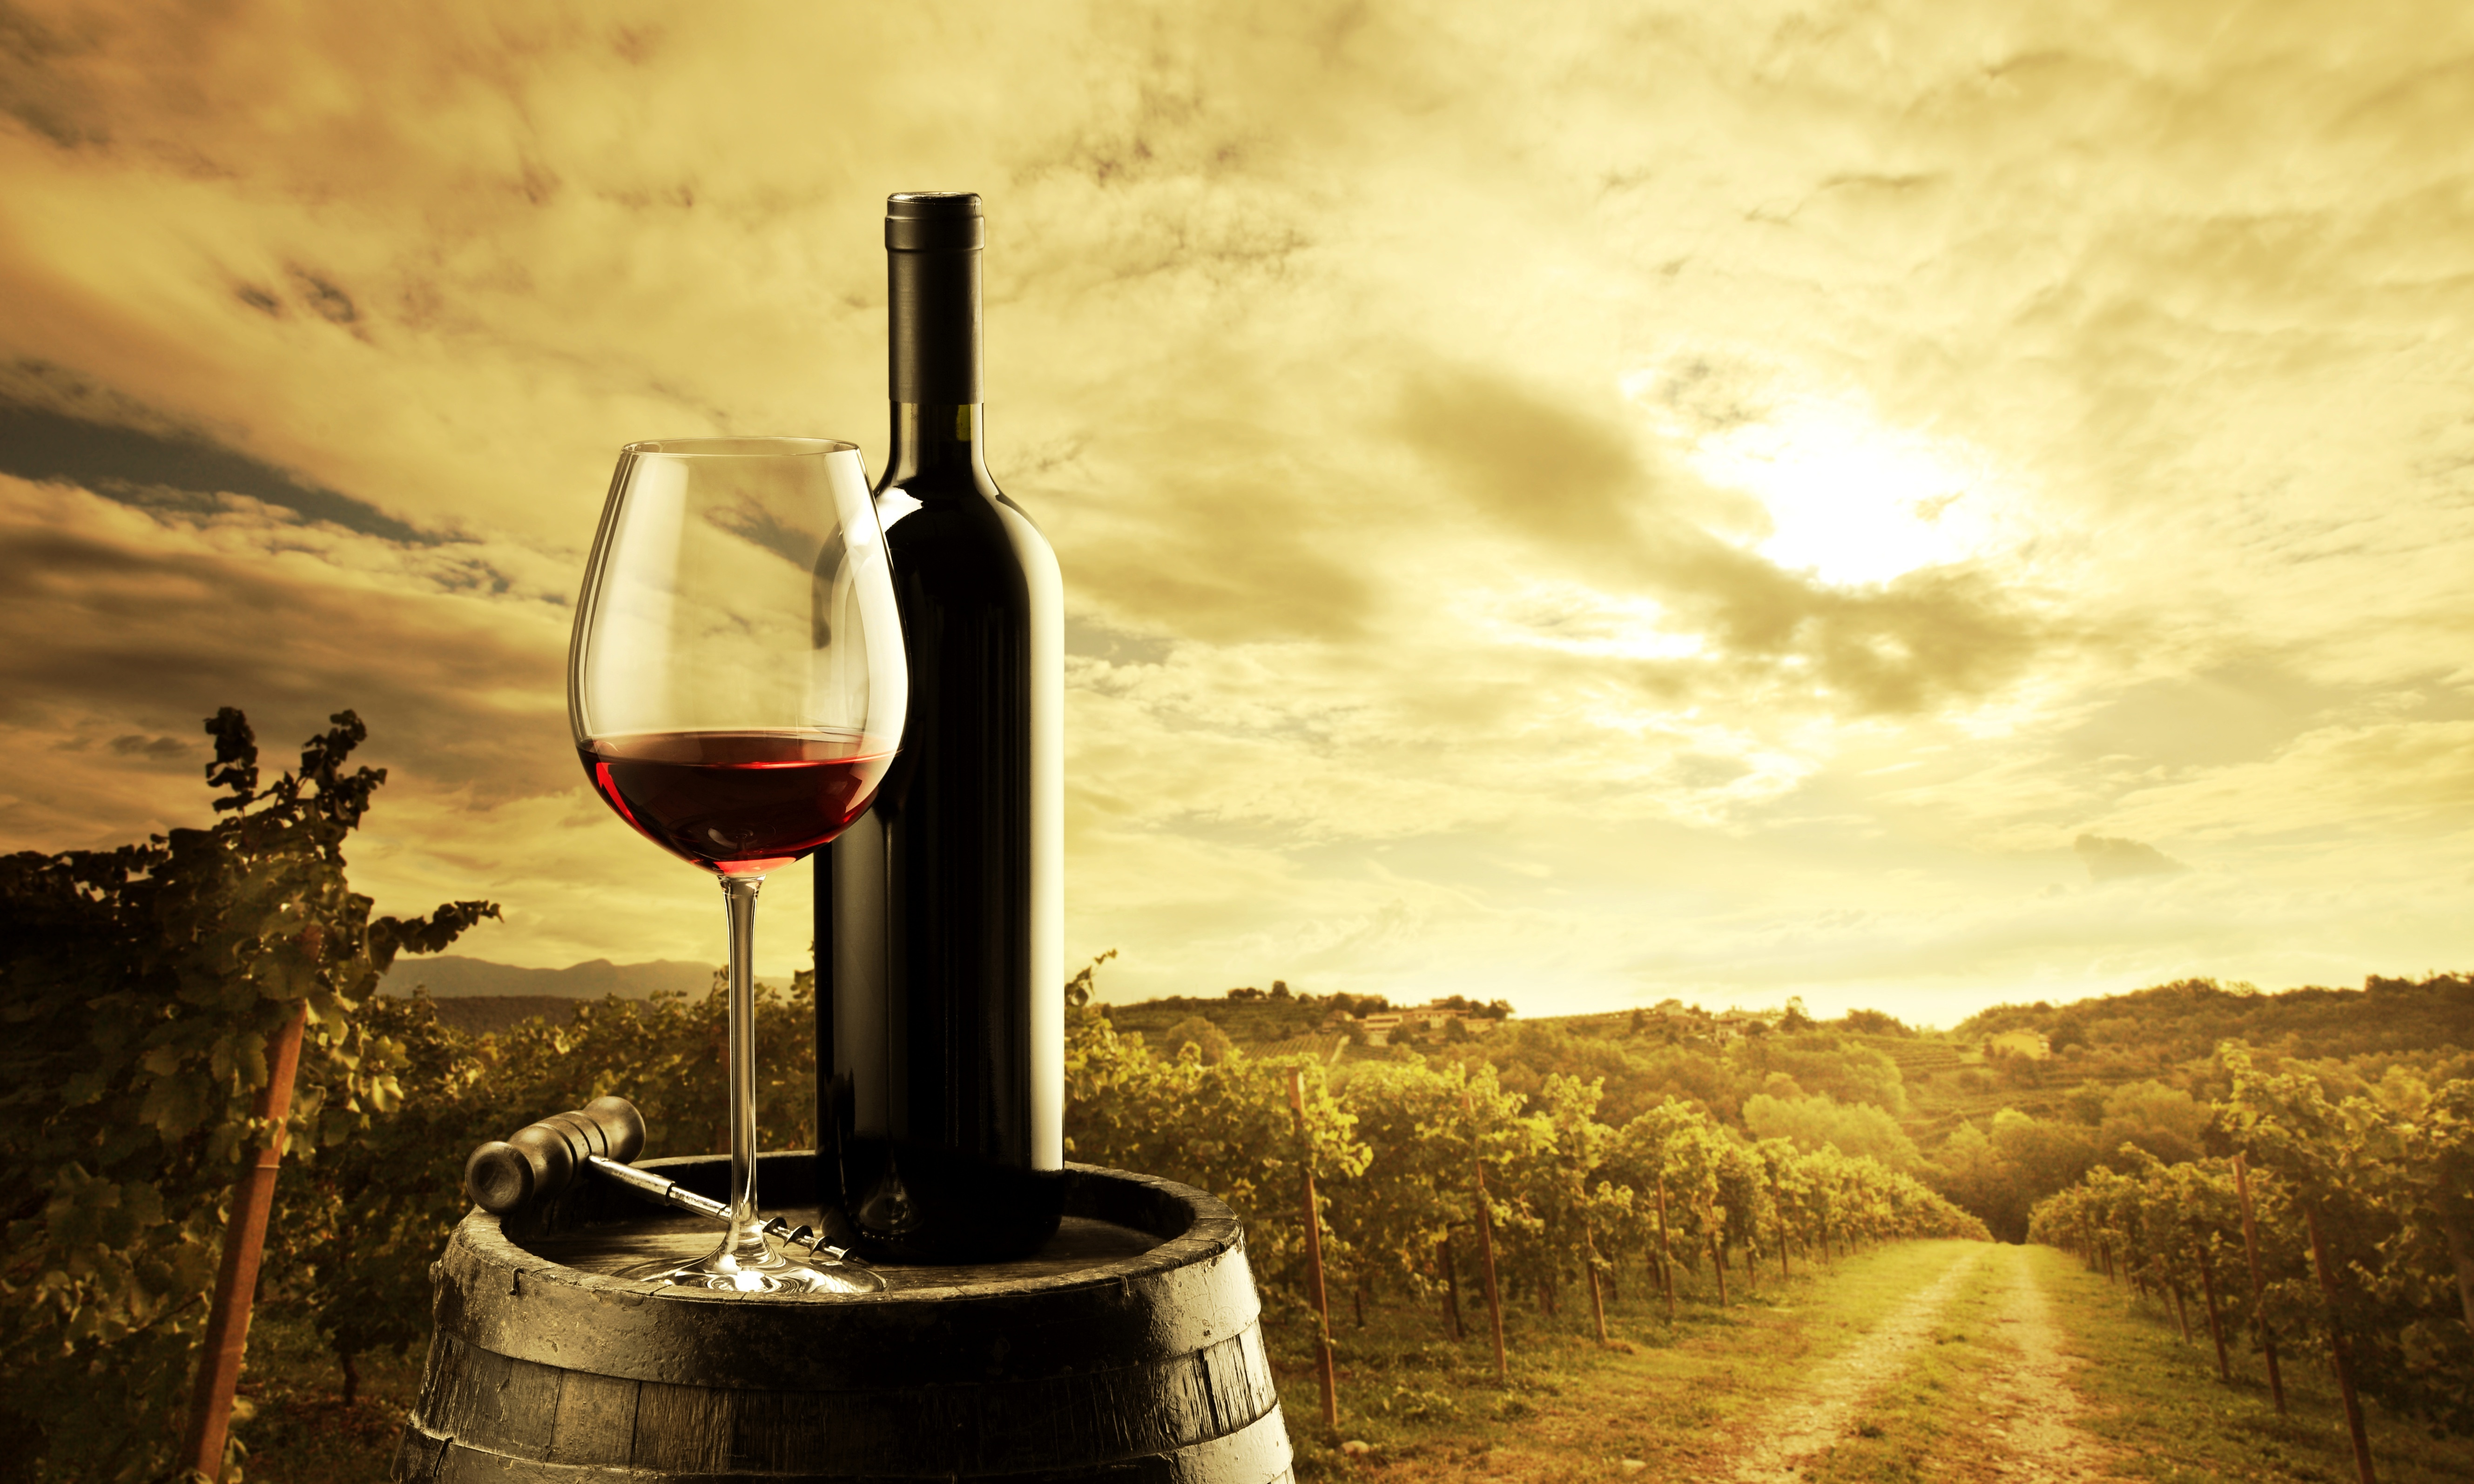 вино, бочка, скрипка, виноград бесплатно